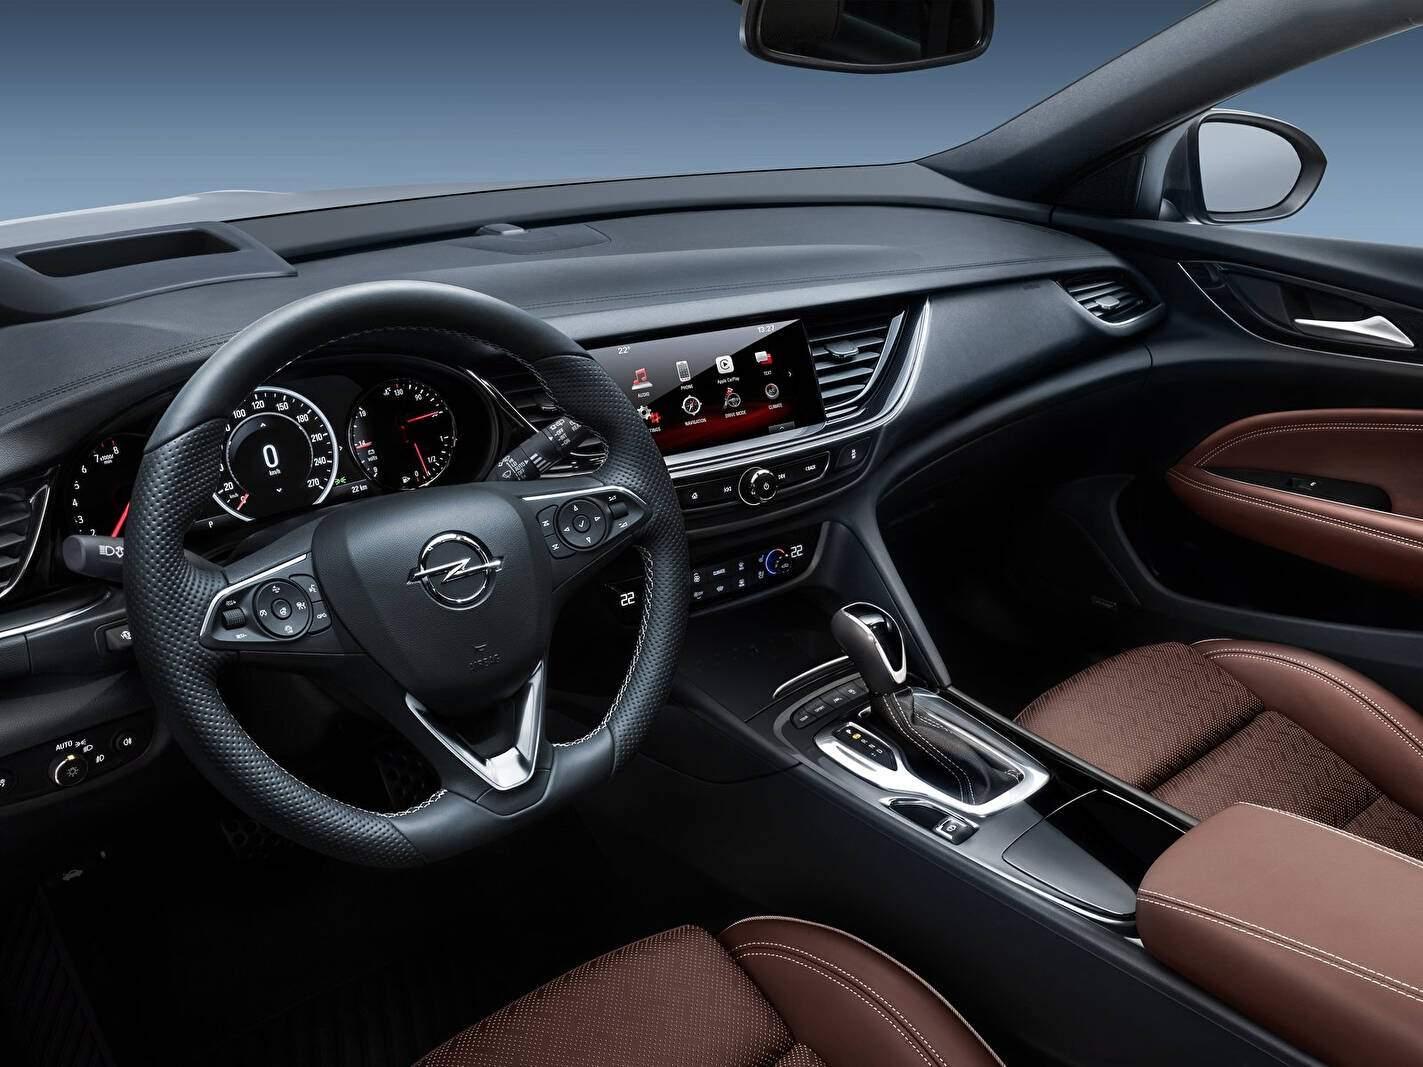 Opel Insignia II Country Tourer 2.0 Turbo D 170 (B) (2017),  ajouté par fox58